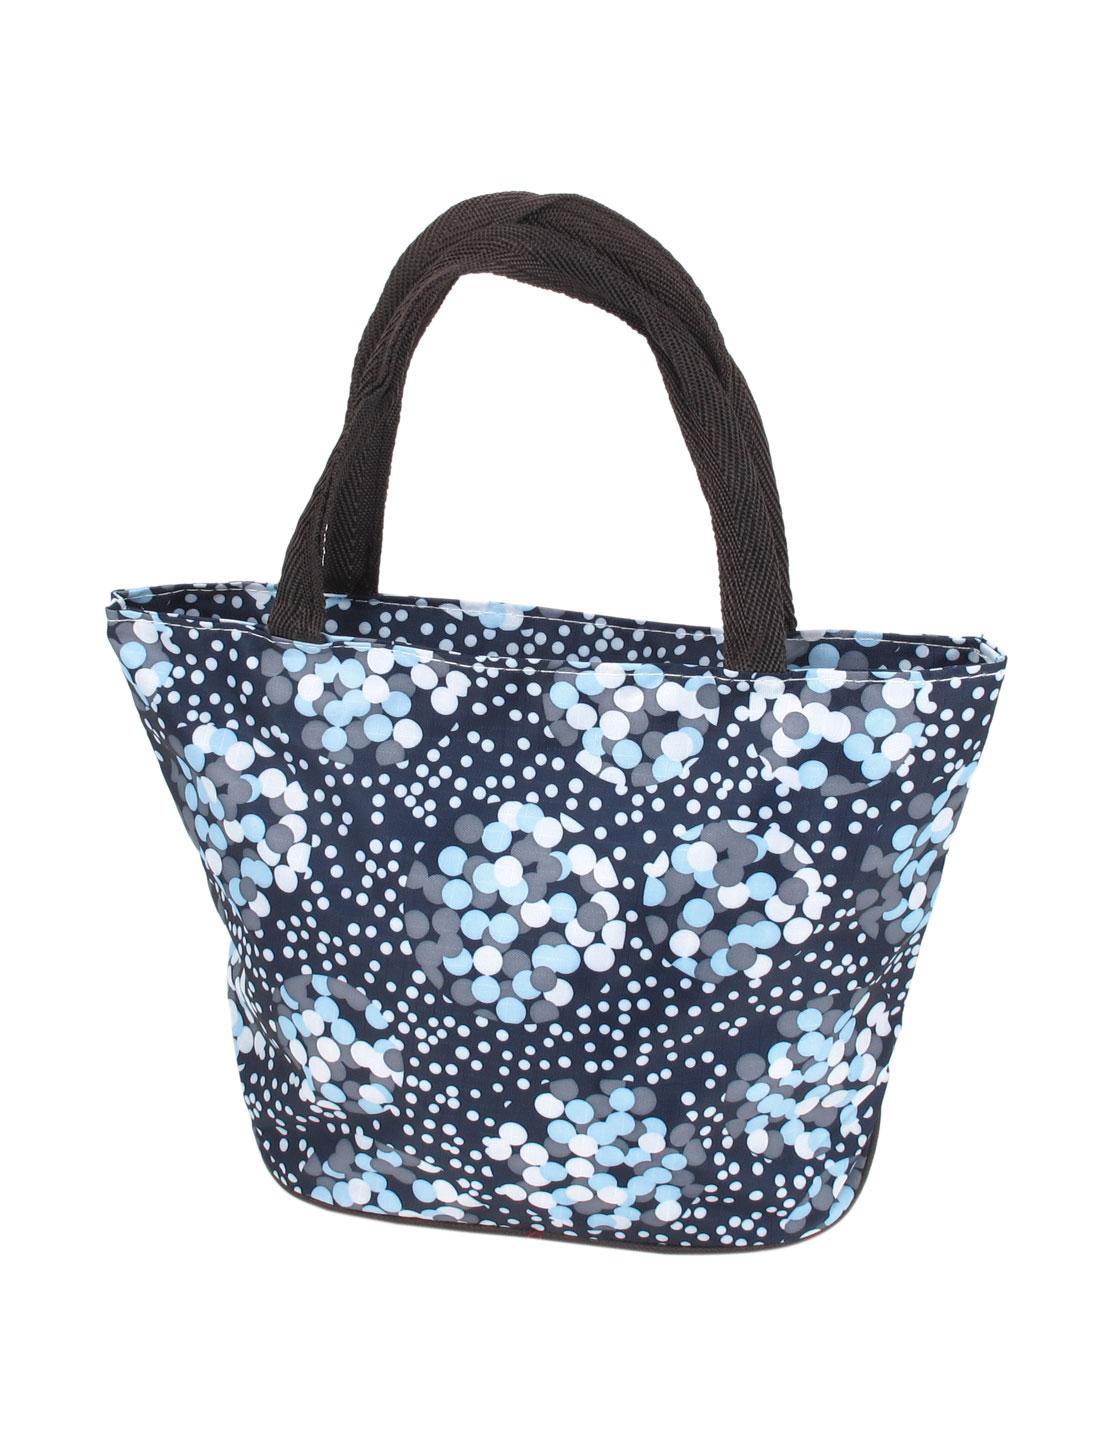 Ladies Dots Pattern Oxford Cloth Zippered Closure Bag Tote Bag Dark Blue